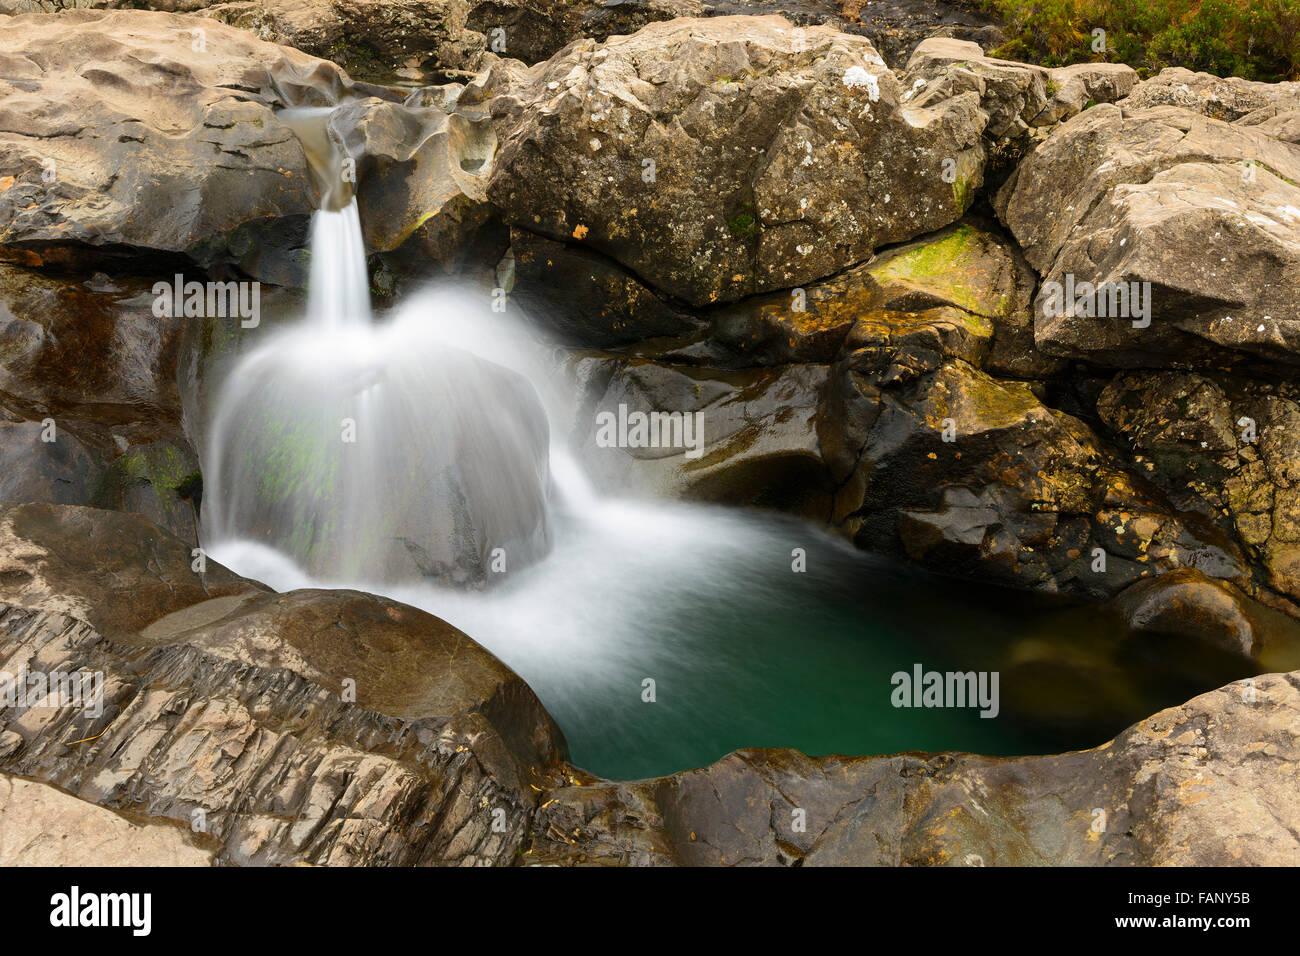 Small waterfall, Fairy Pools, Isle of Skye, Scotland - Stock Image